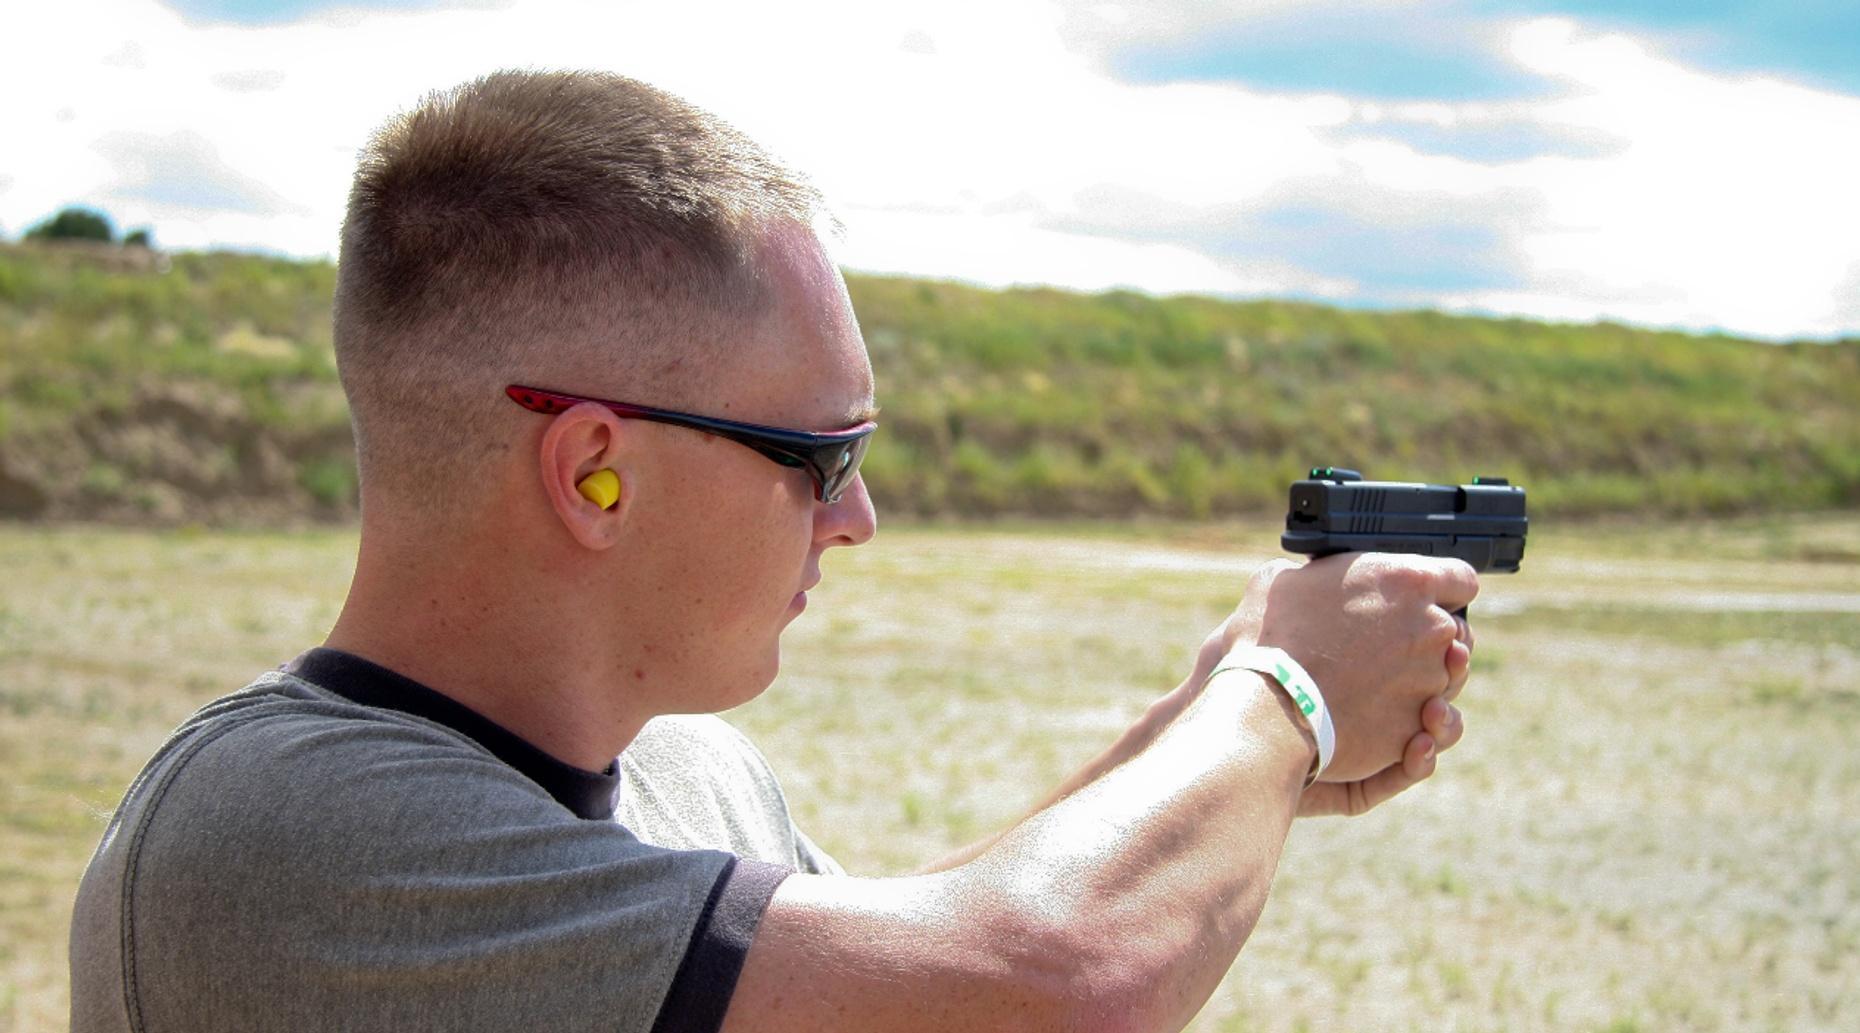 HR-218 Gun Handling Course in Pennsylvania